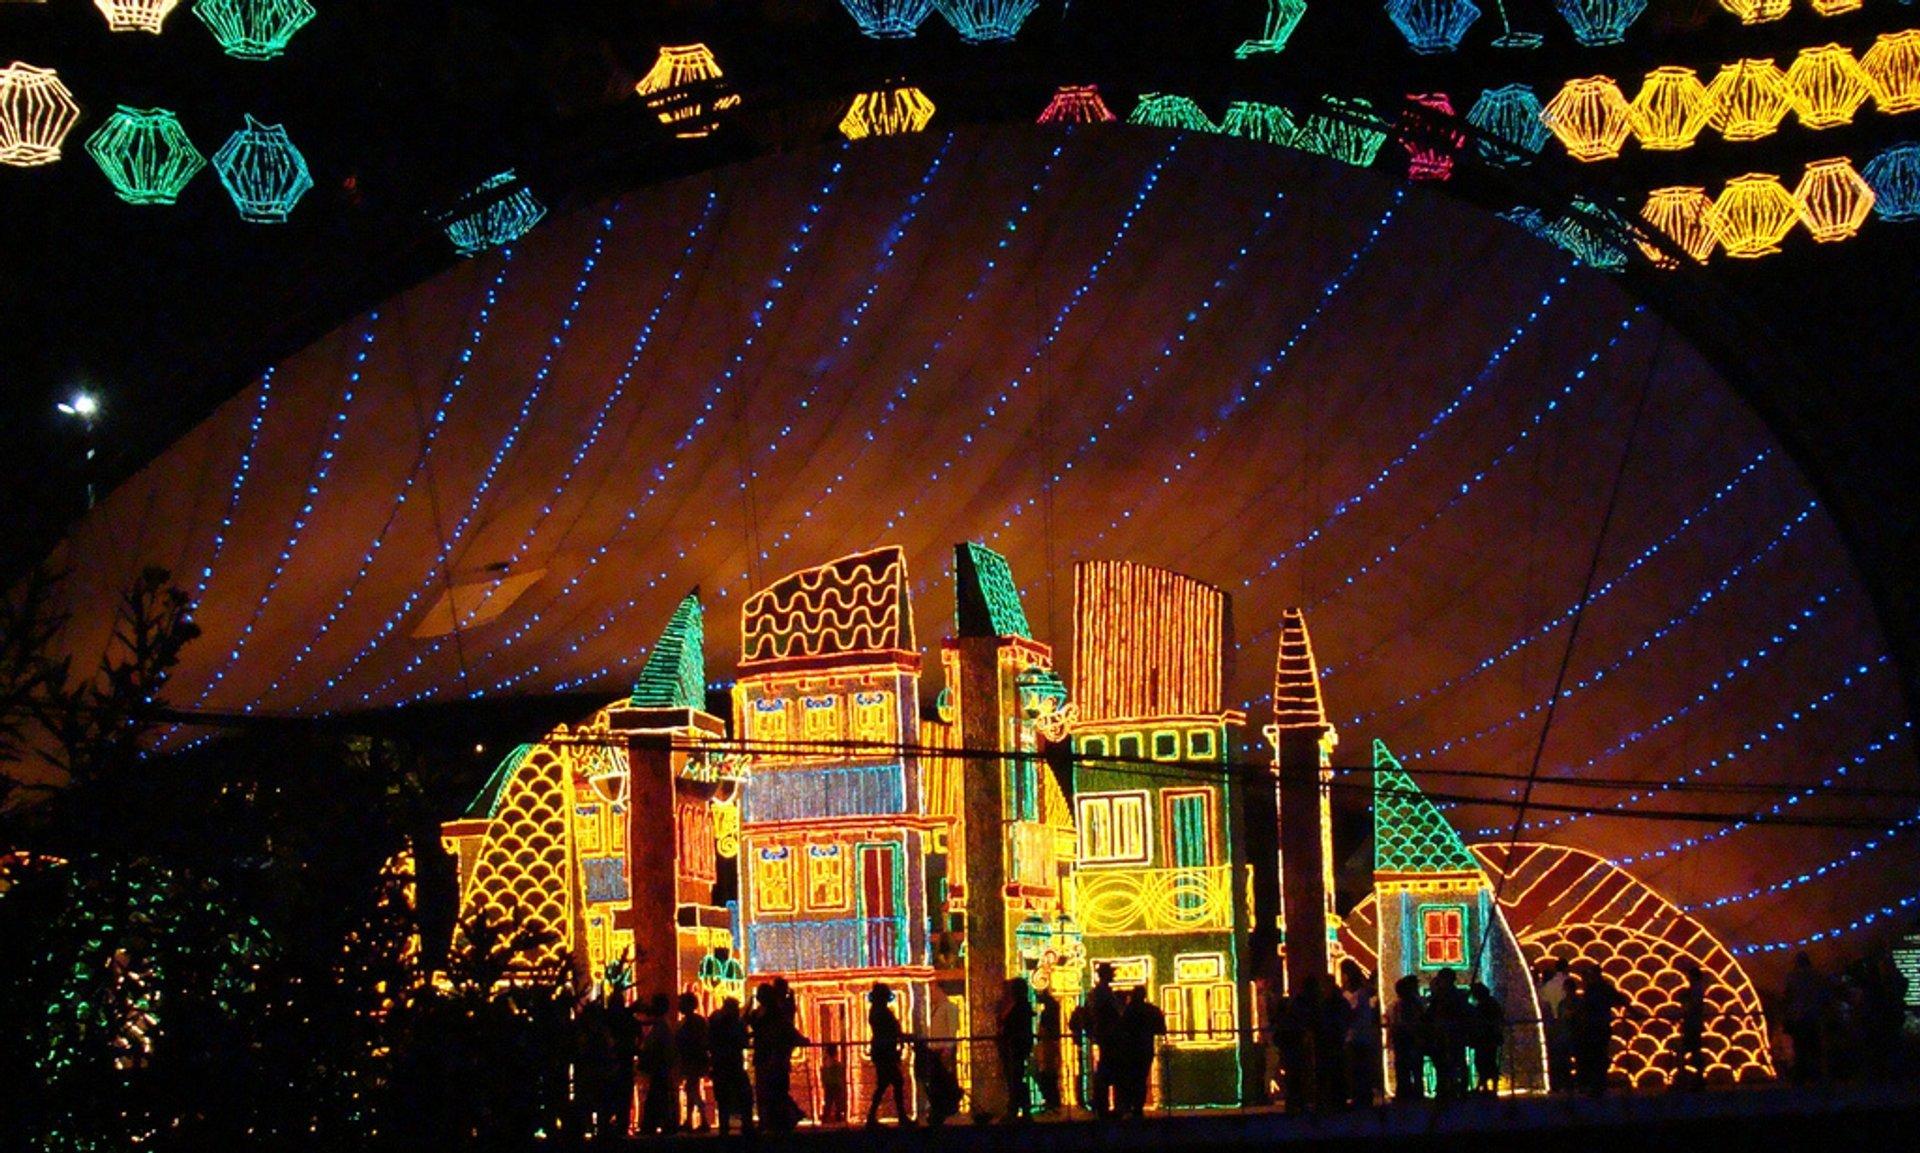 Best time for Christmas Lights (Alumbrados) in Medellín in Colombia 2020